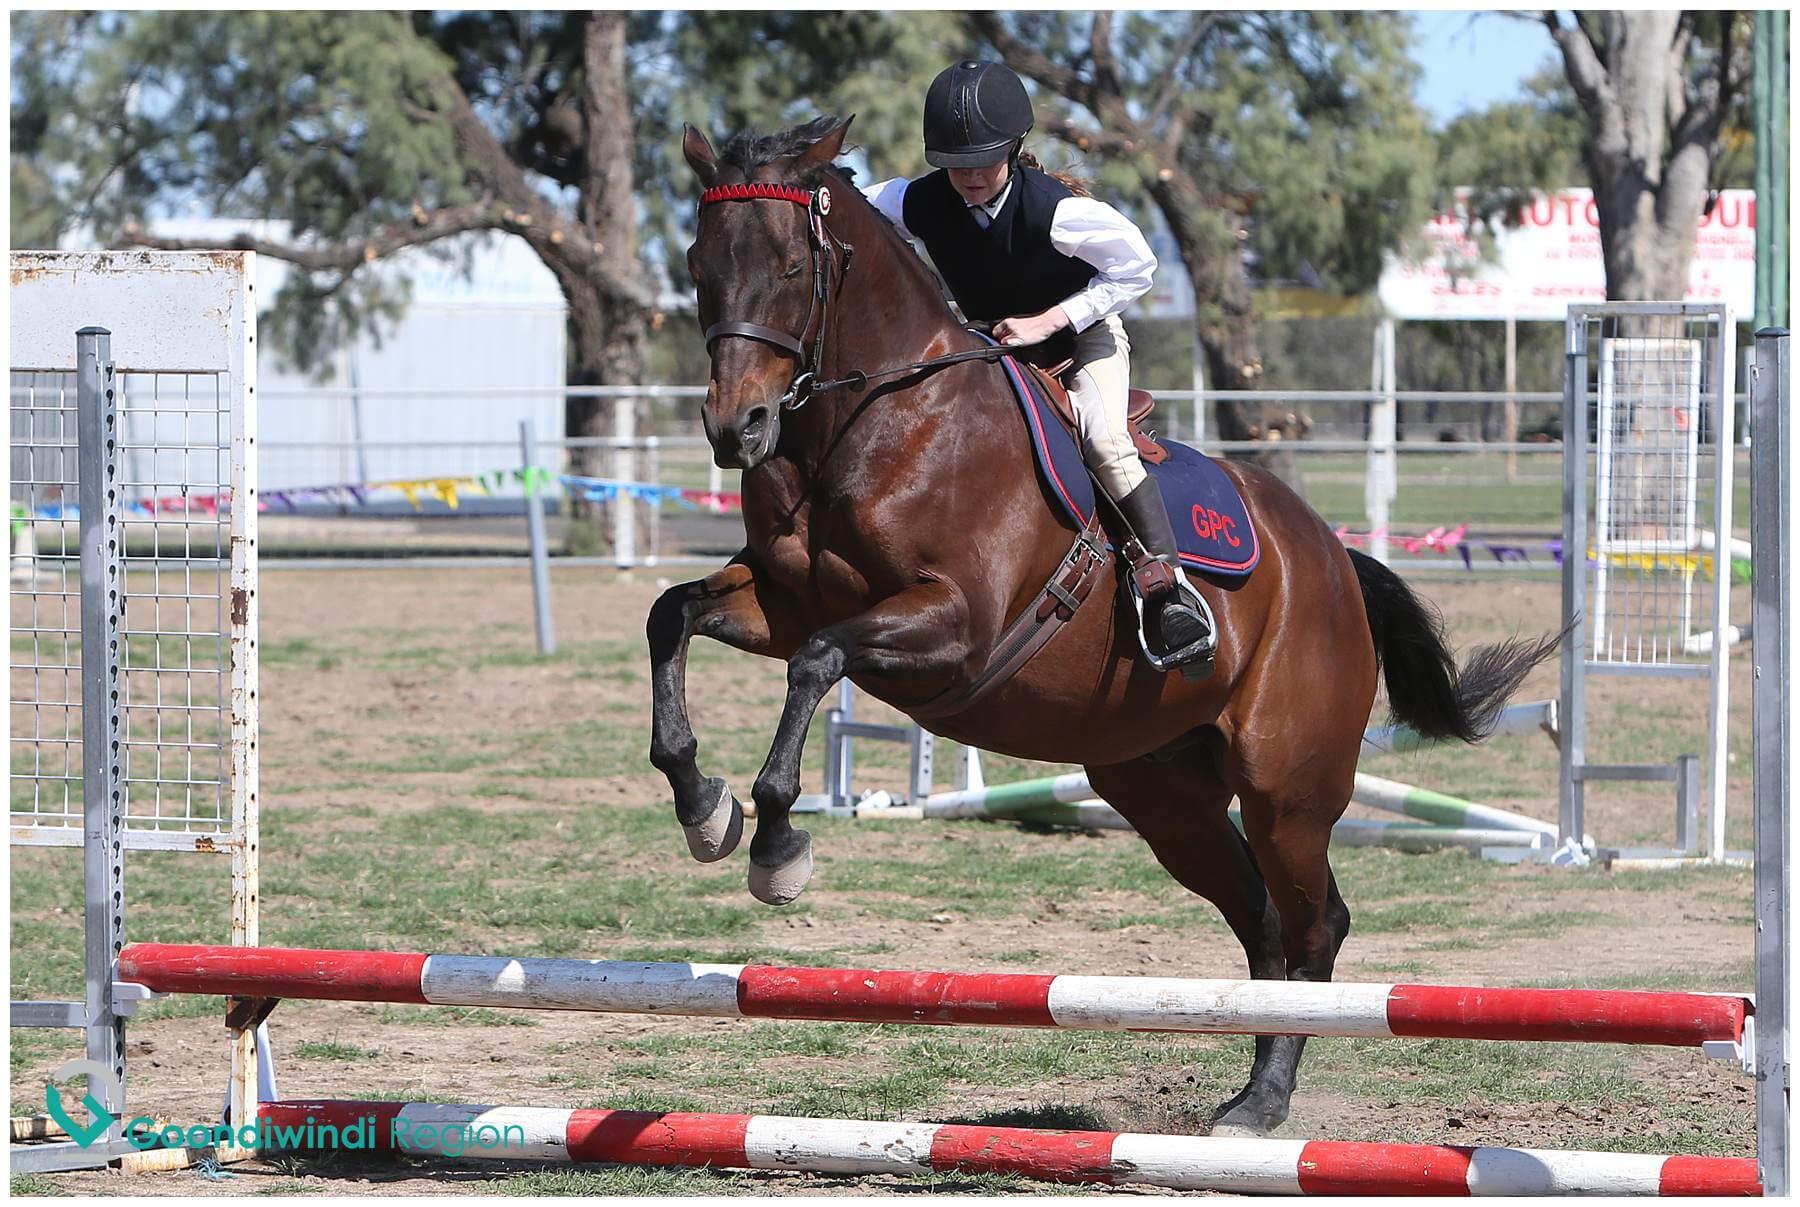 0M5A1216 - Goondiwindi Pony Club Mounted Games